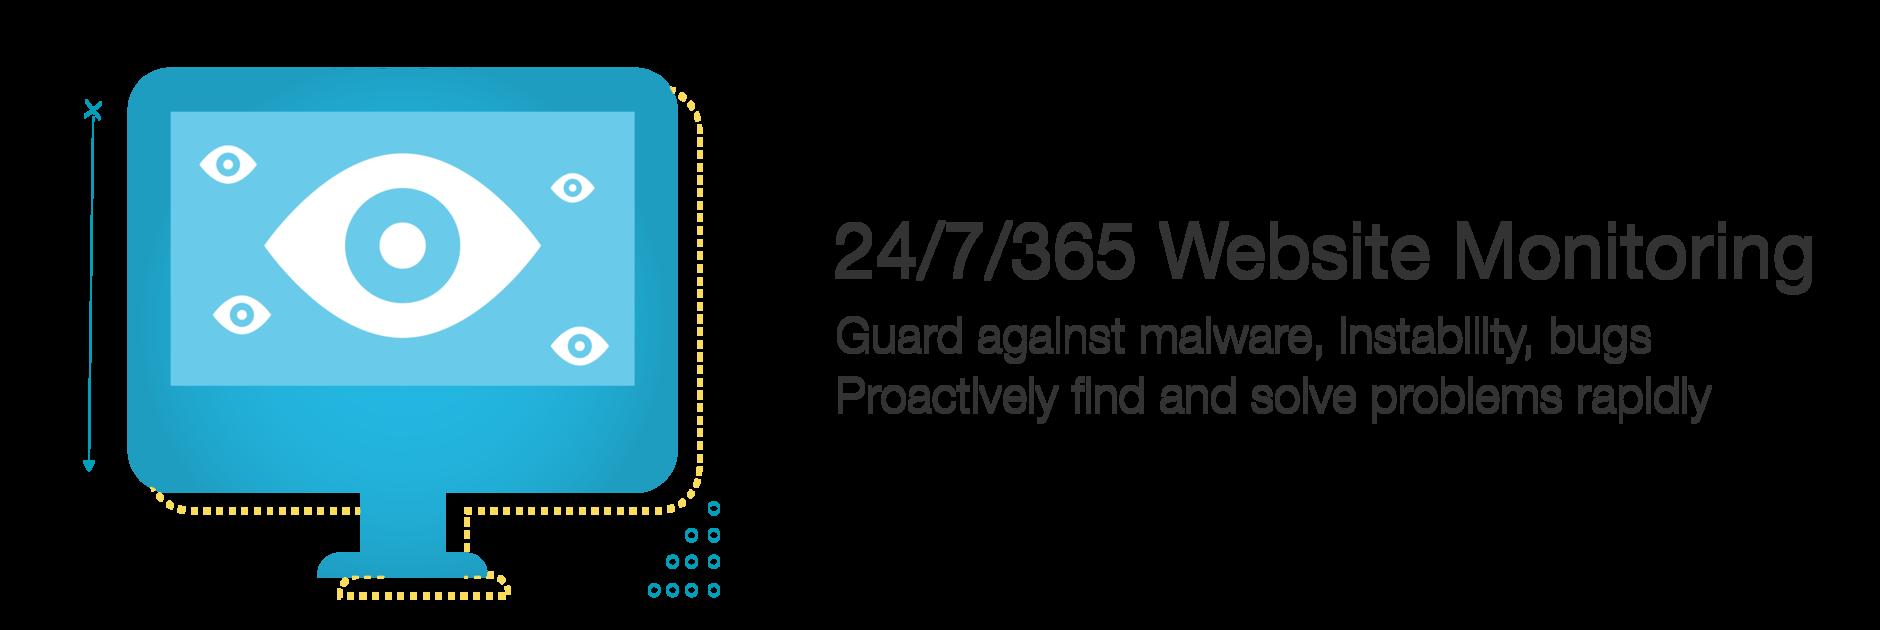 24/7/365 Website Monitoring